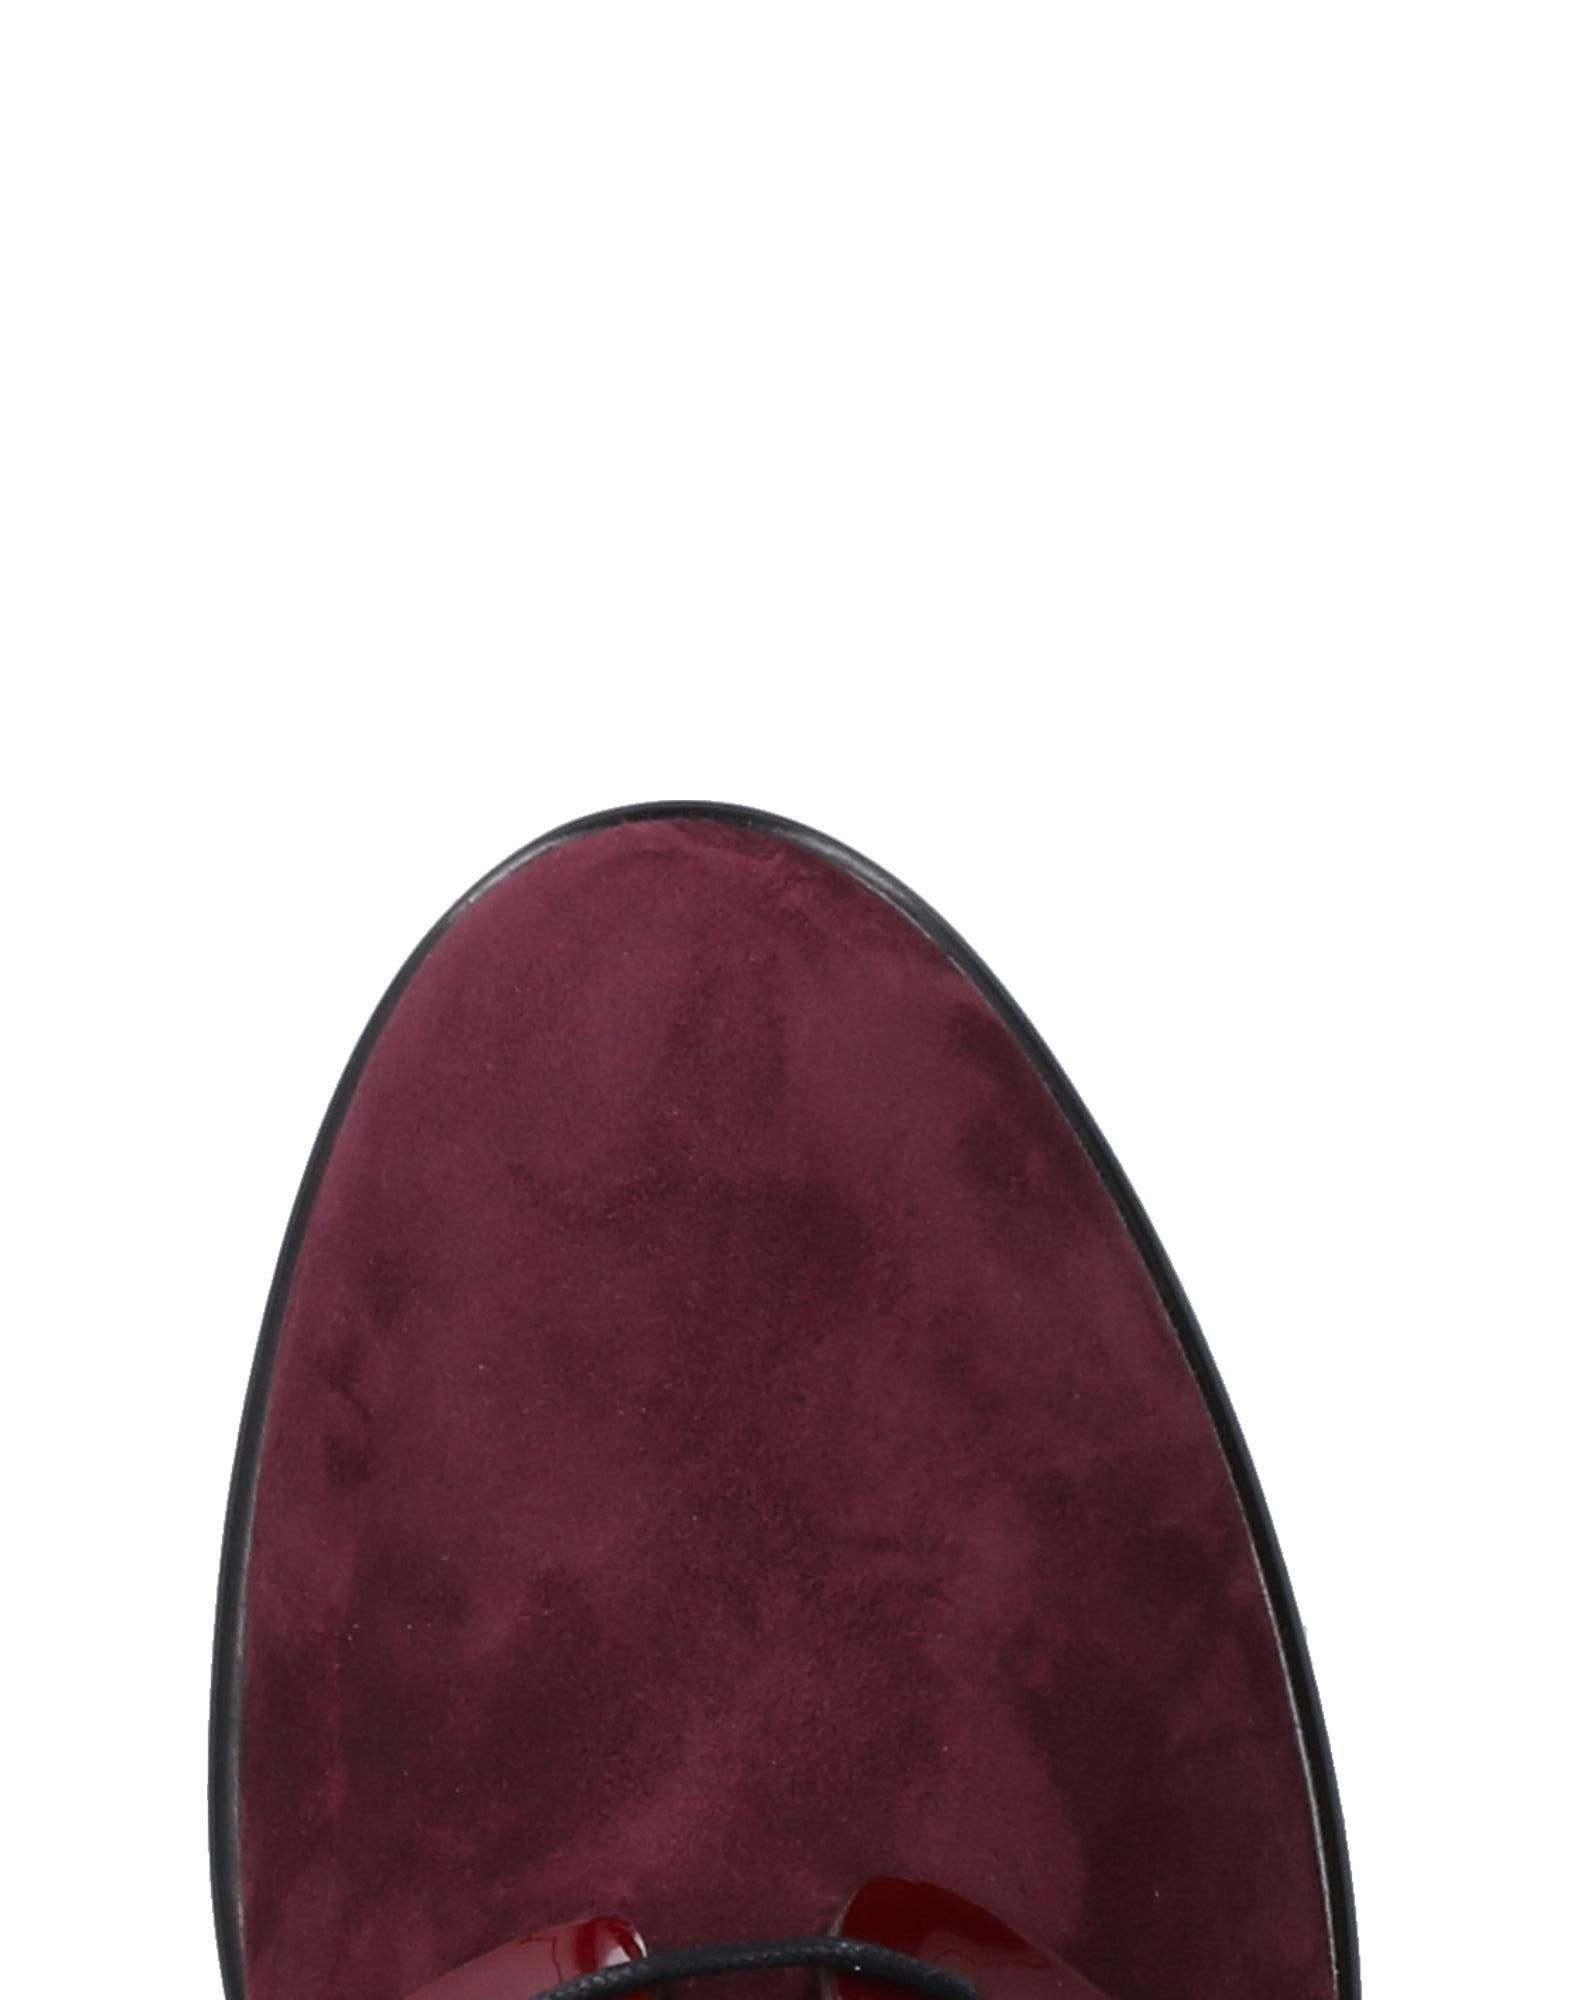 Stilvolle billige Schnürschuhe Schuhe Pas De Rouge Schnürschuhe billige Damen  11510790MR 035c4d